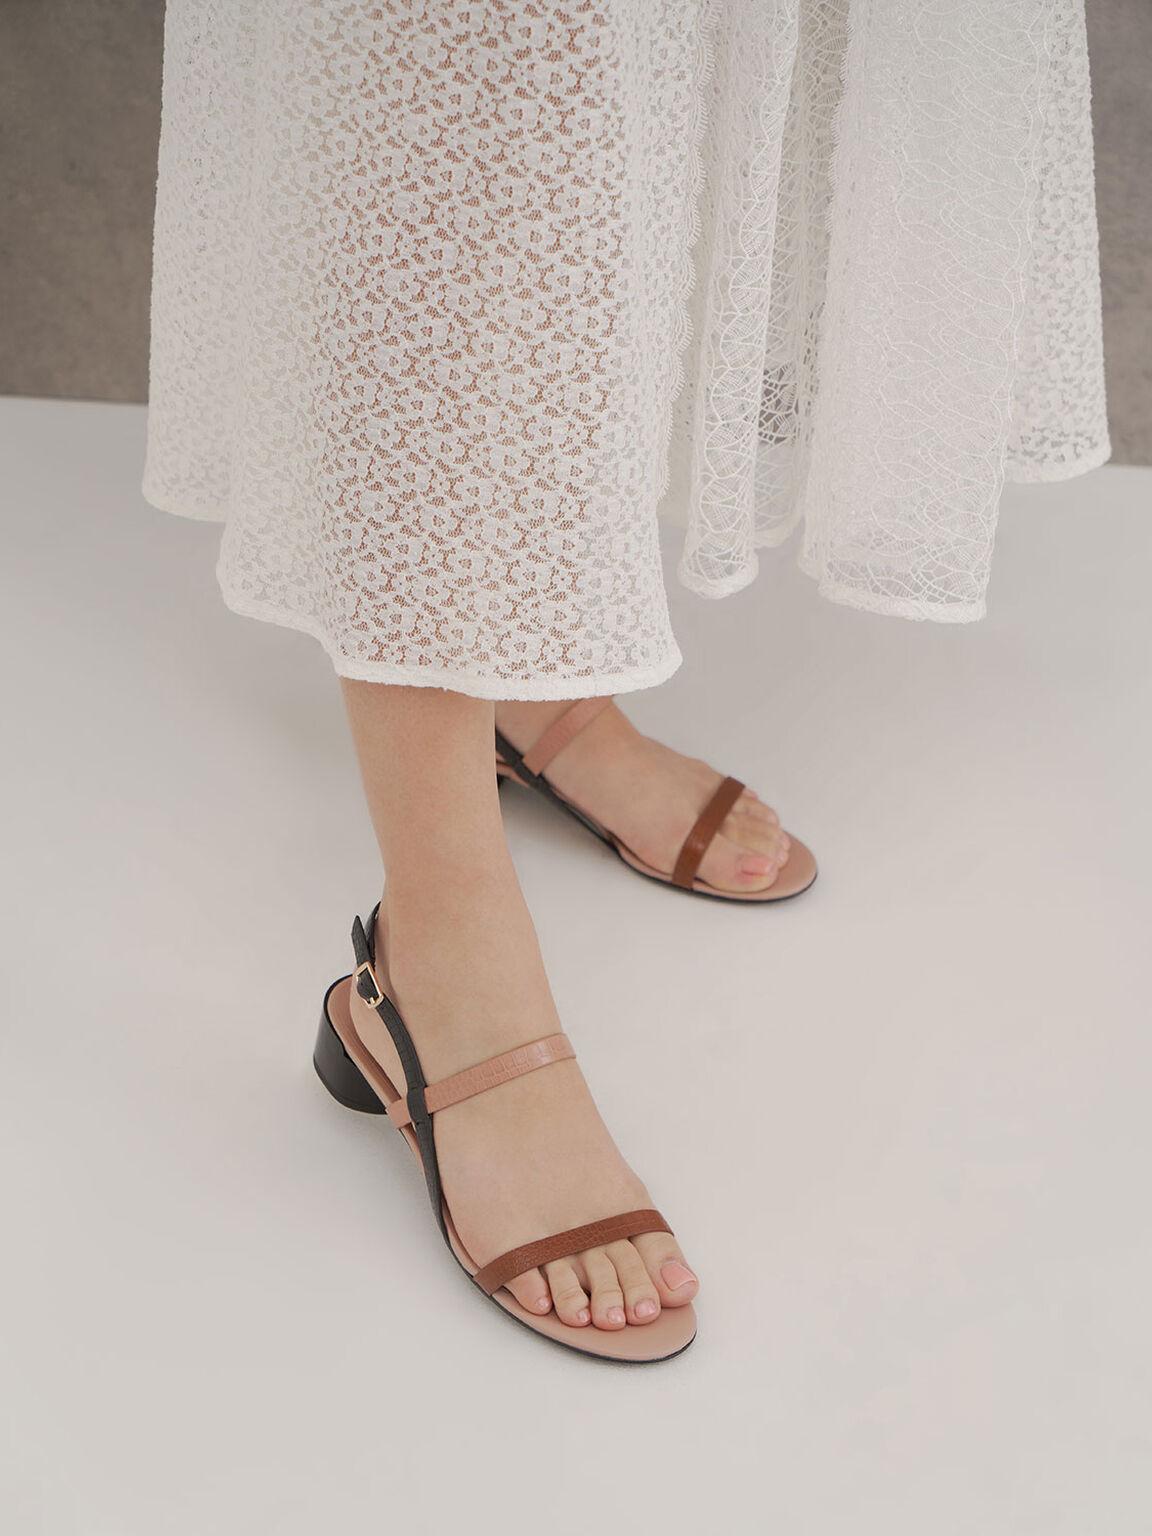 Croc-Effect Strappy Heeled Sandals, Multi, hi-res